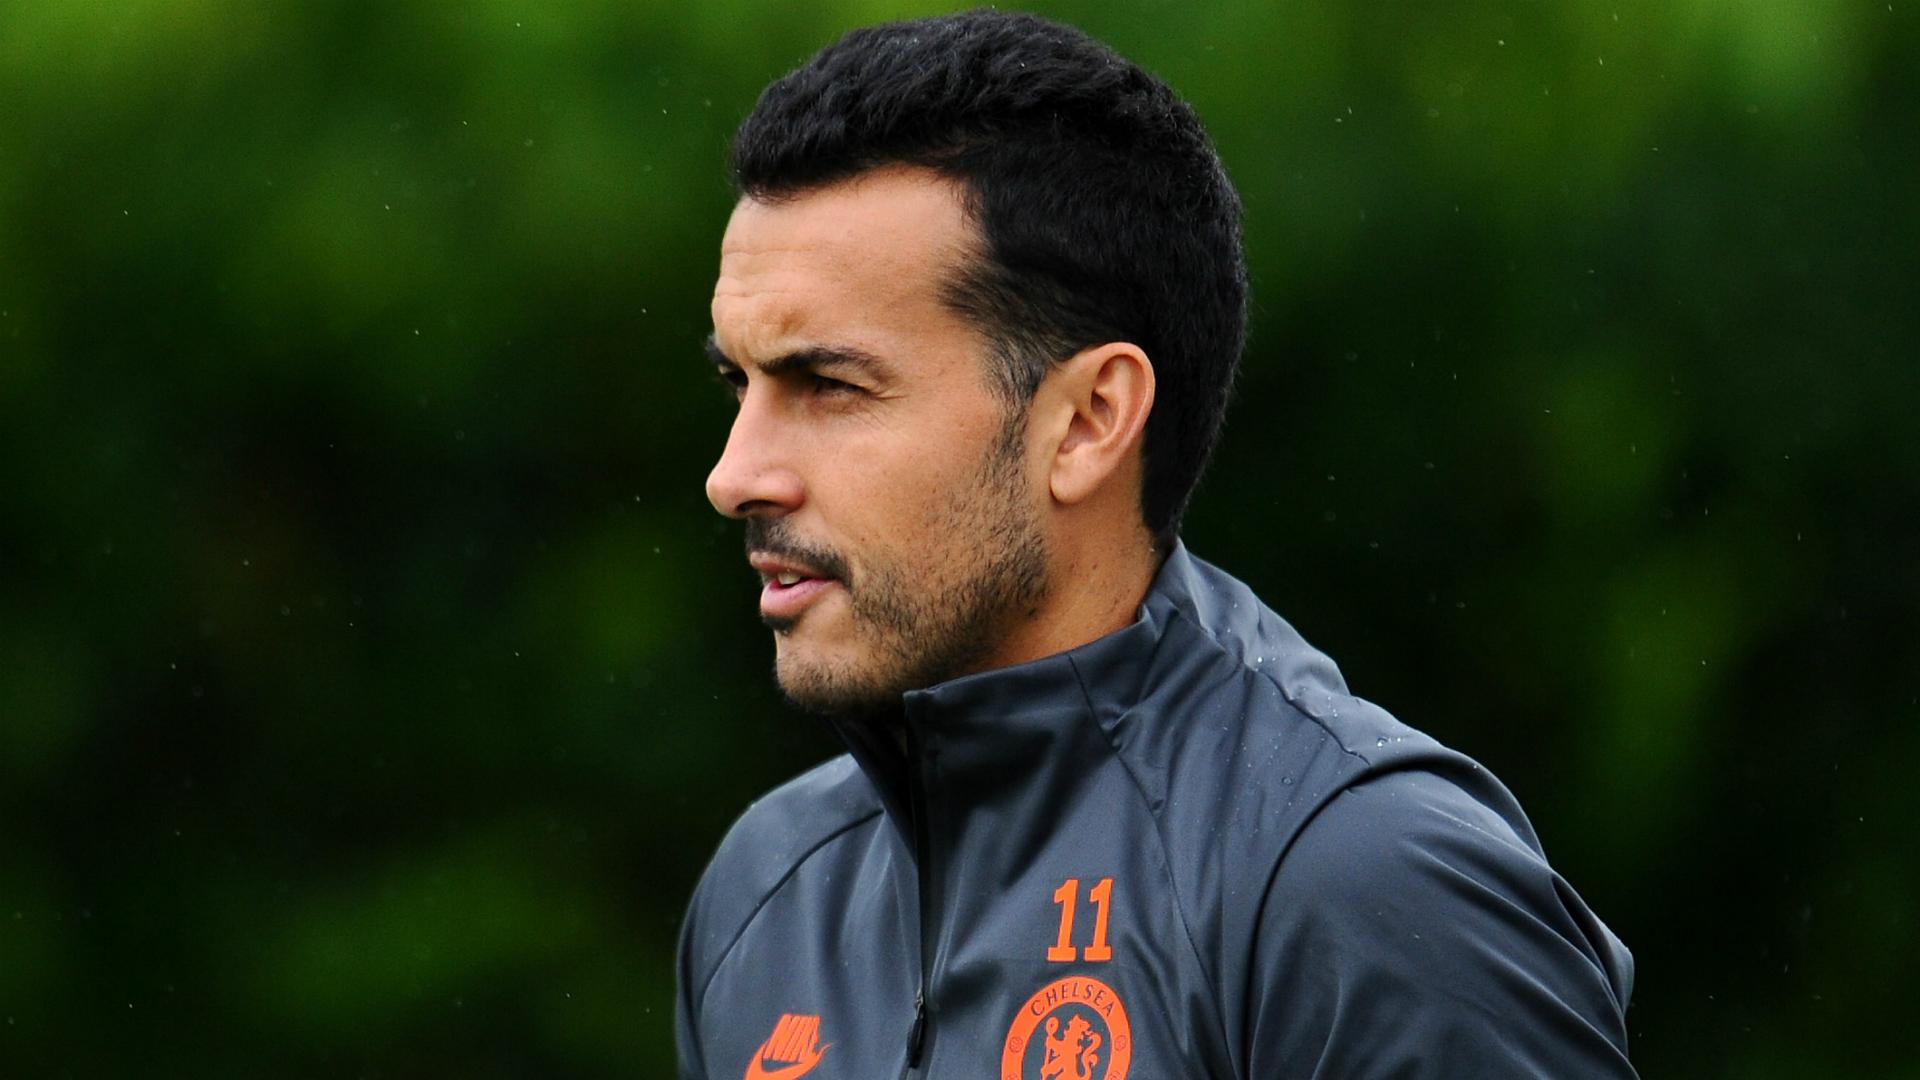 Valverde hails 'historic' Pedro as talk of Barcelona return builds